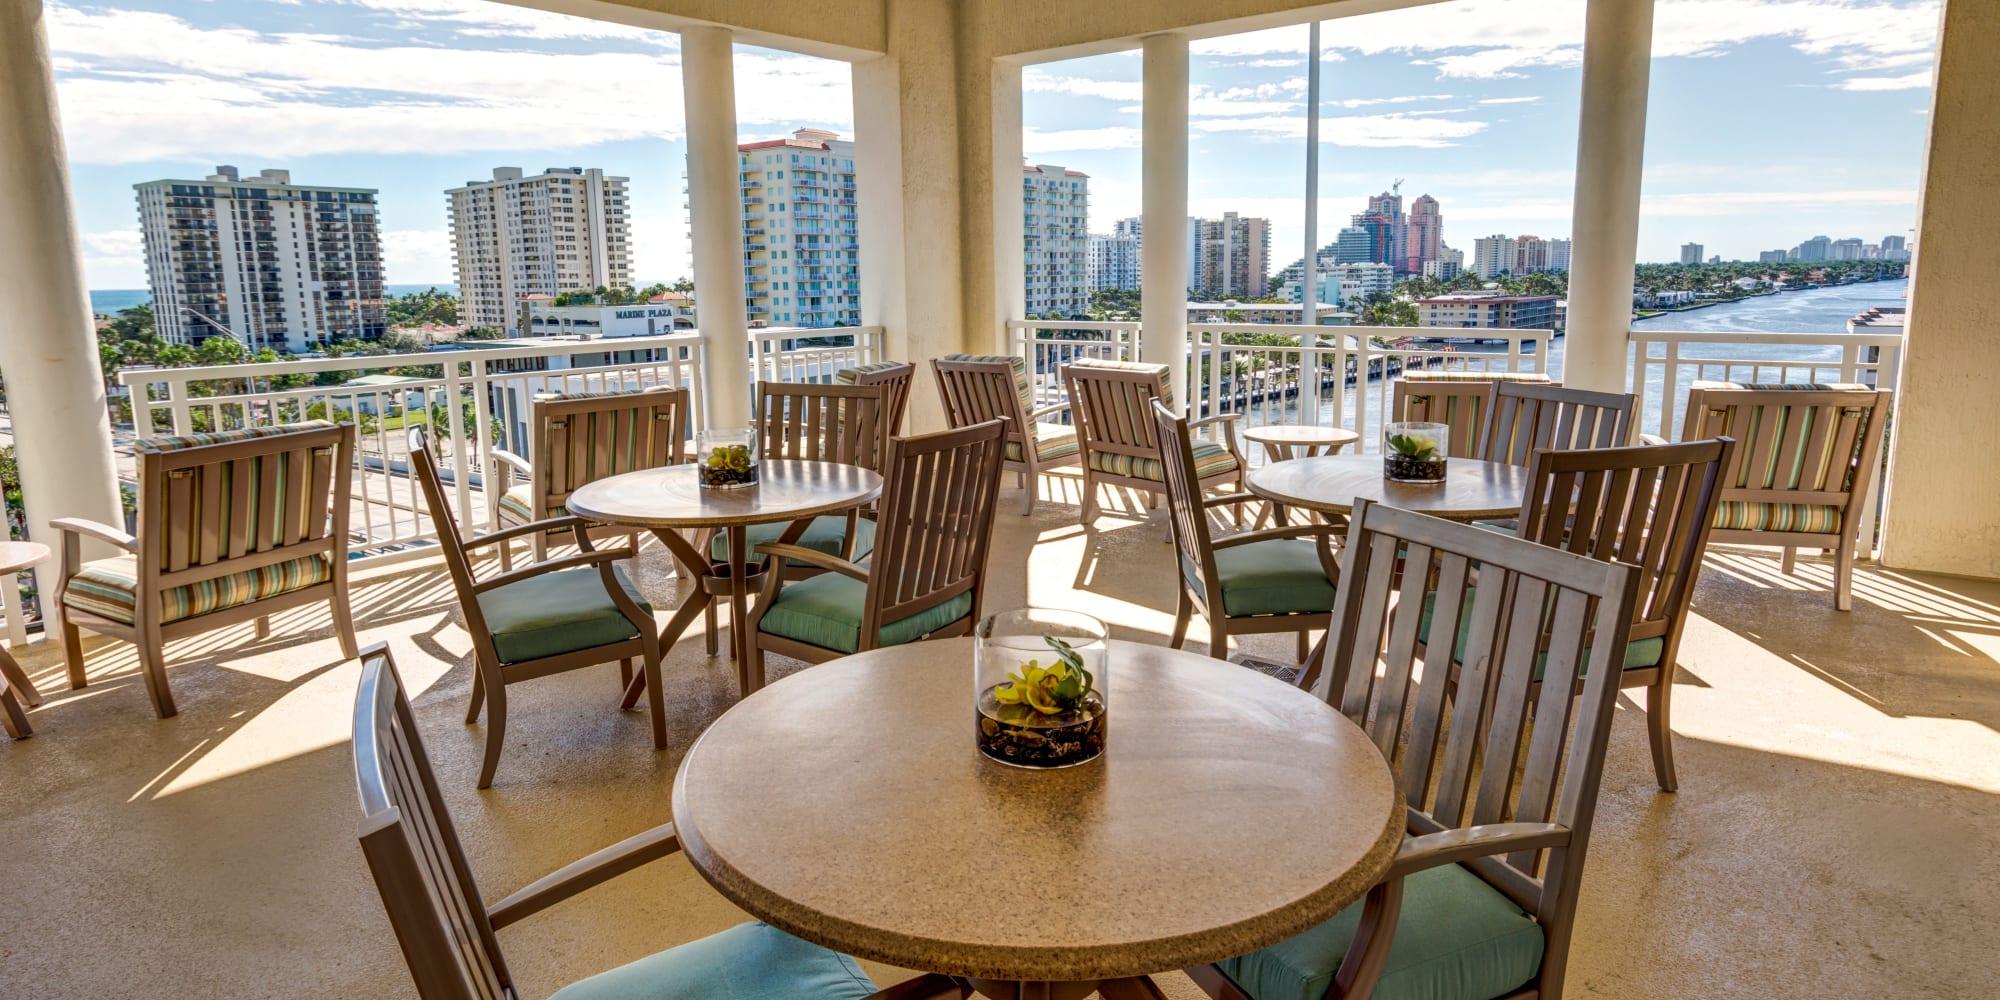 The Meridian at Waterways senior living in Fort Lauderdale, Florida